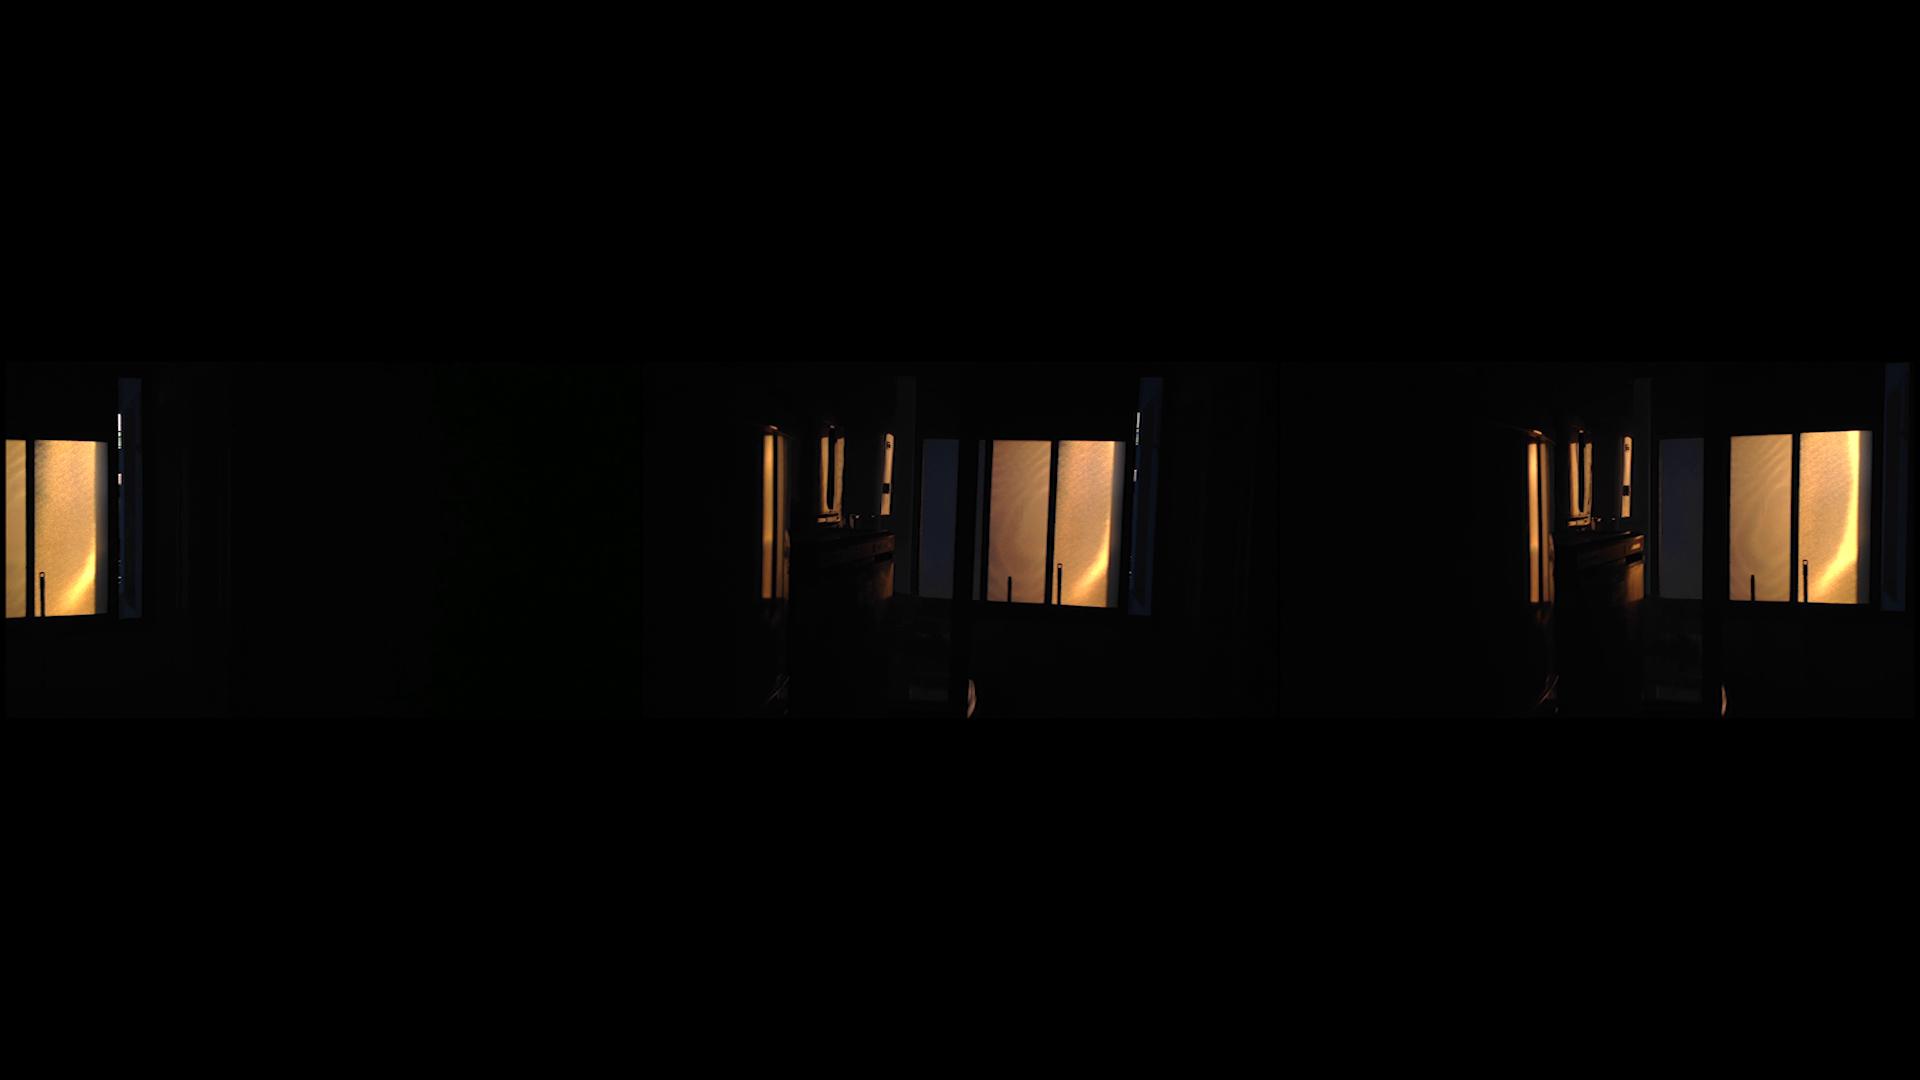 vlcsnap-2014-09-19-08h58m13s75.png